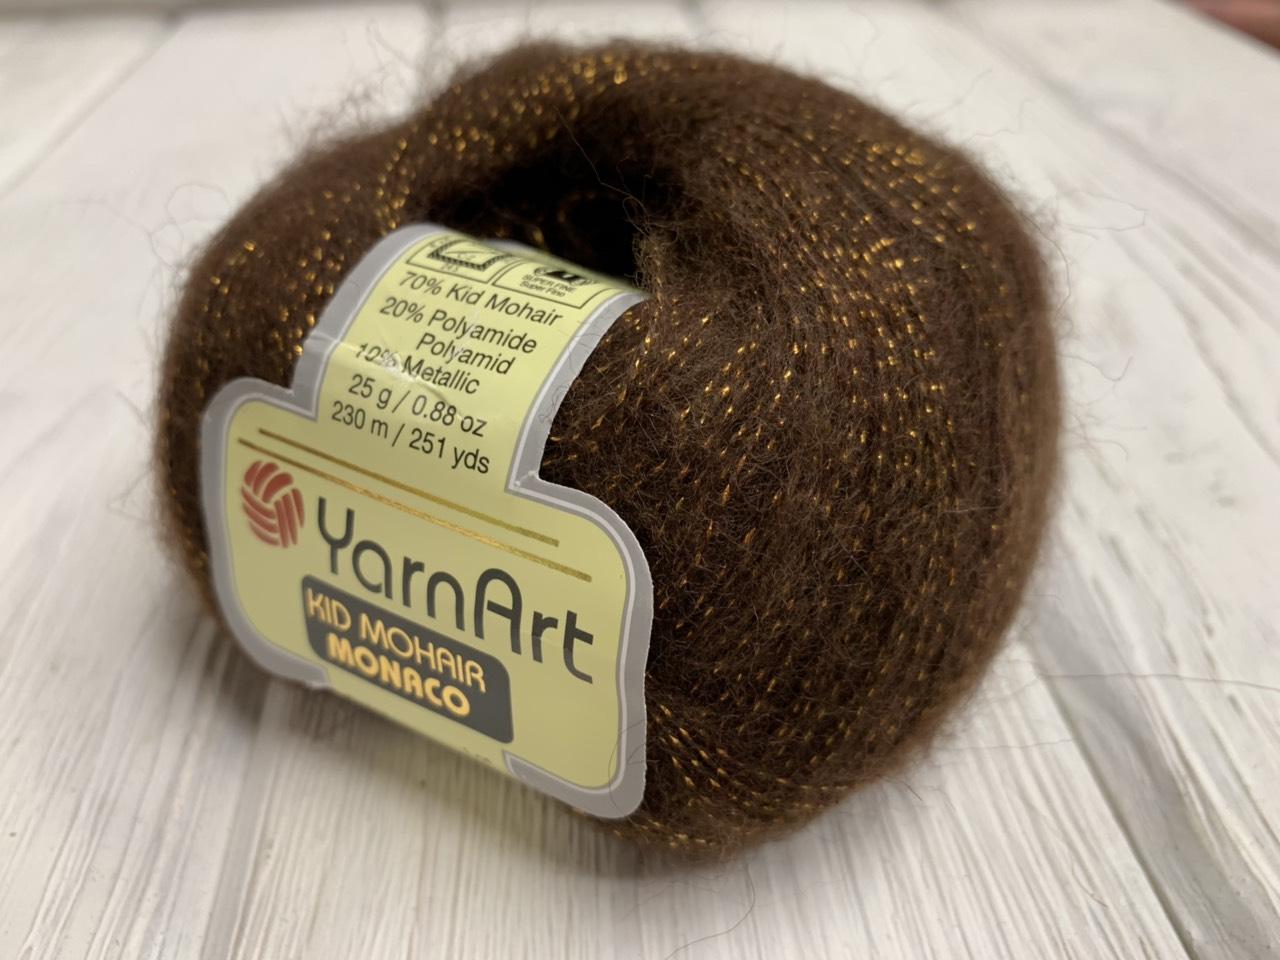 YarnArt Kid mohair Monako (ЯрнАрт Кид мохер Монако) 09 - коричневый заказать по почте в Беларуси